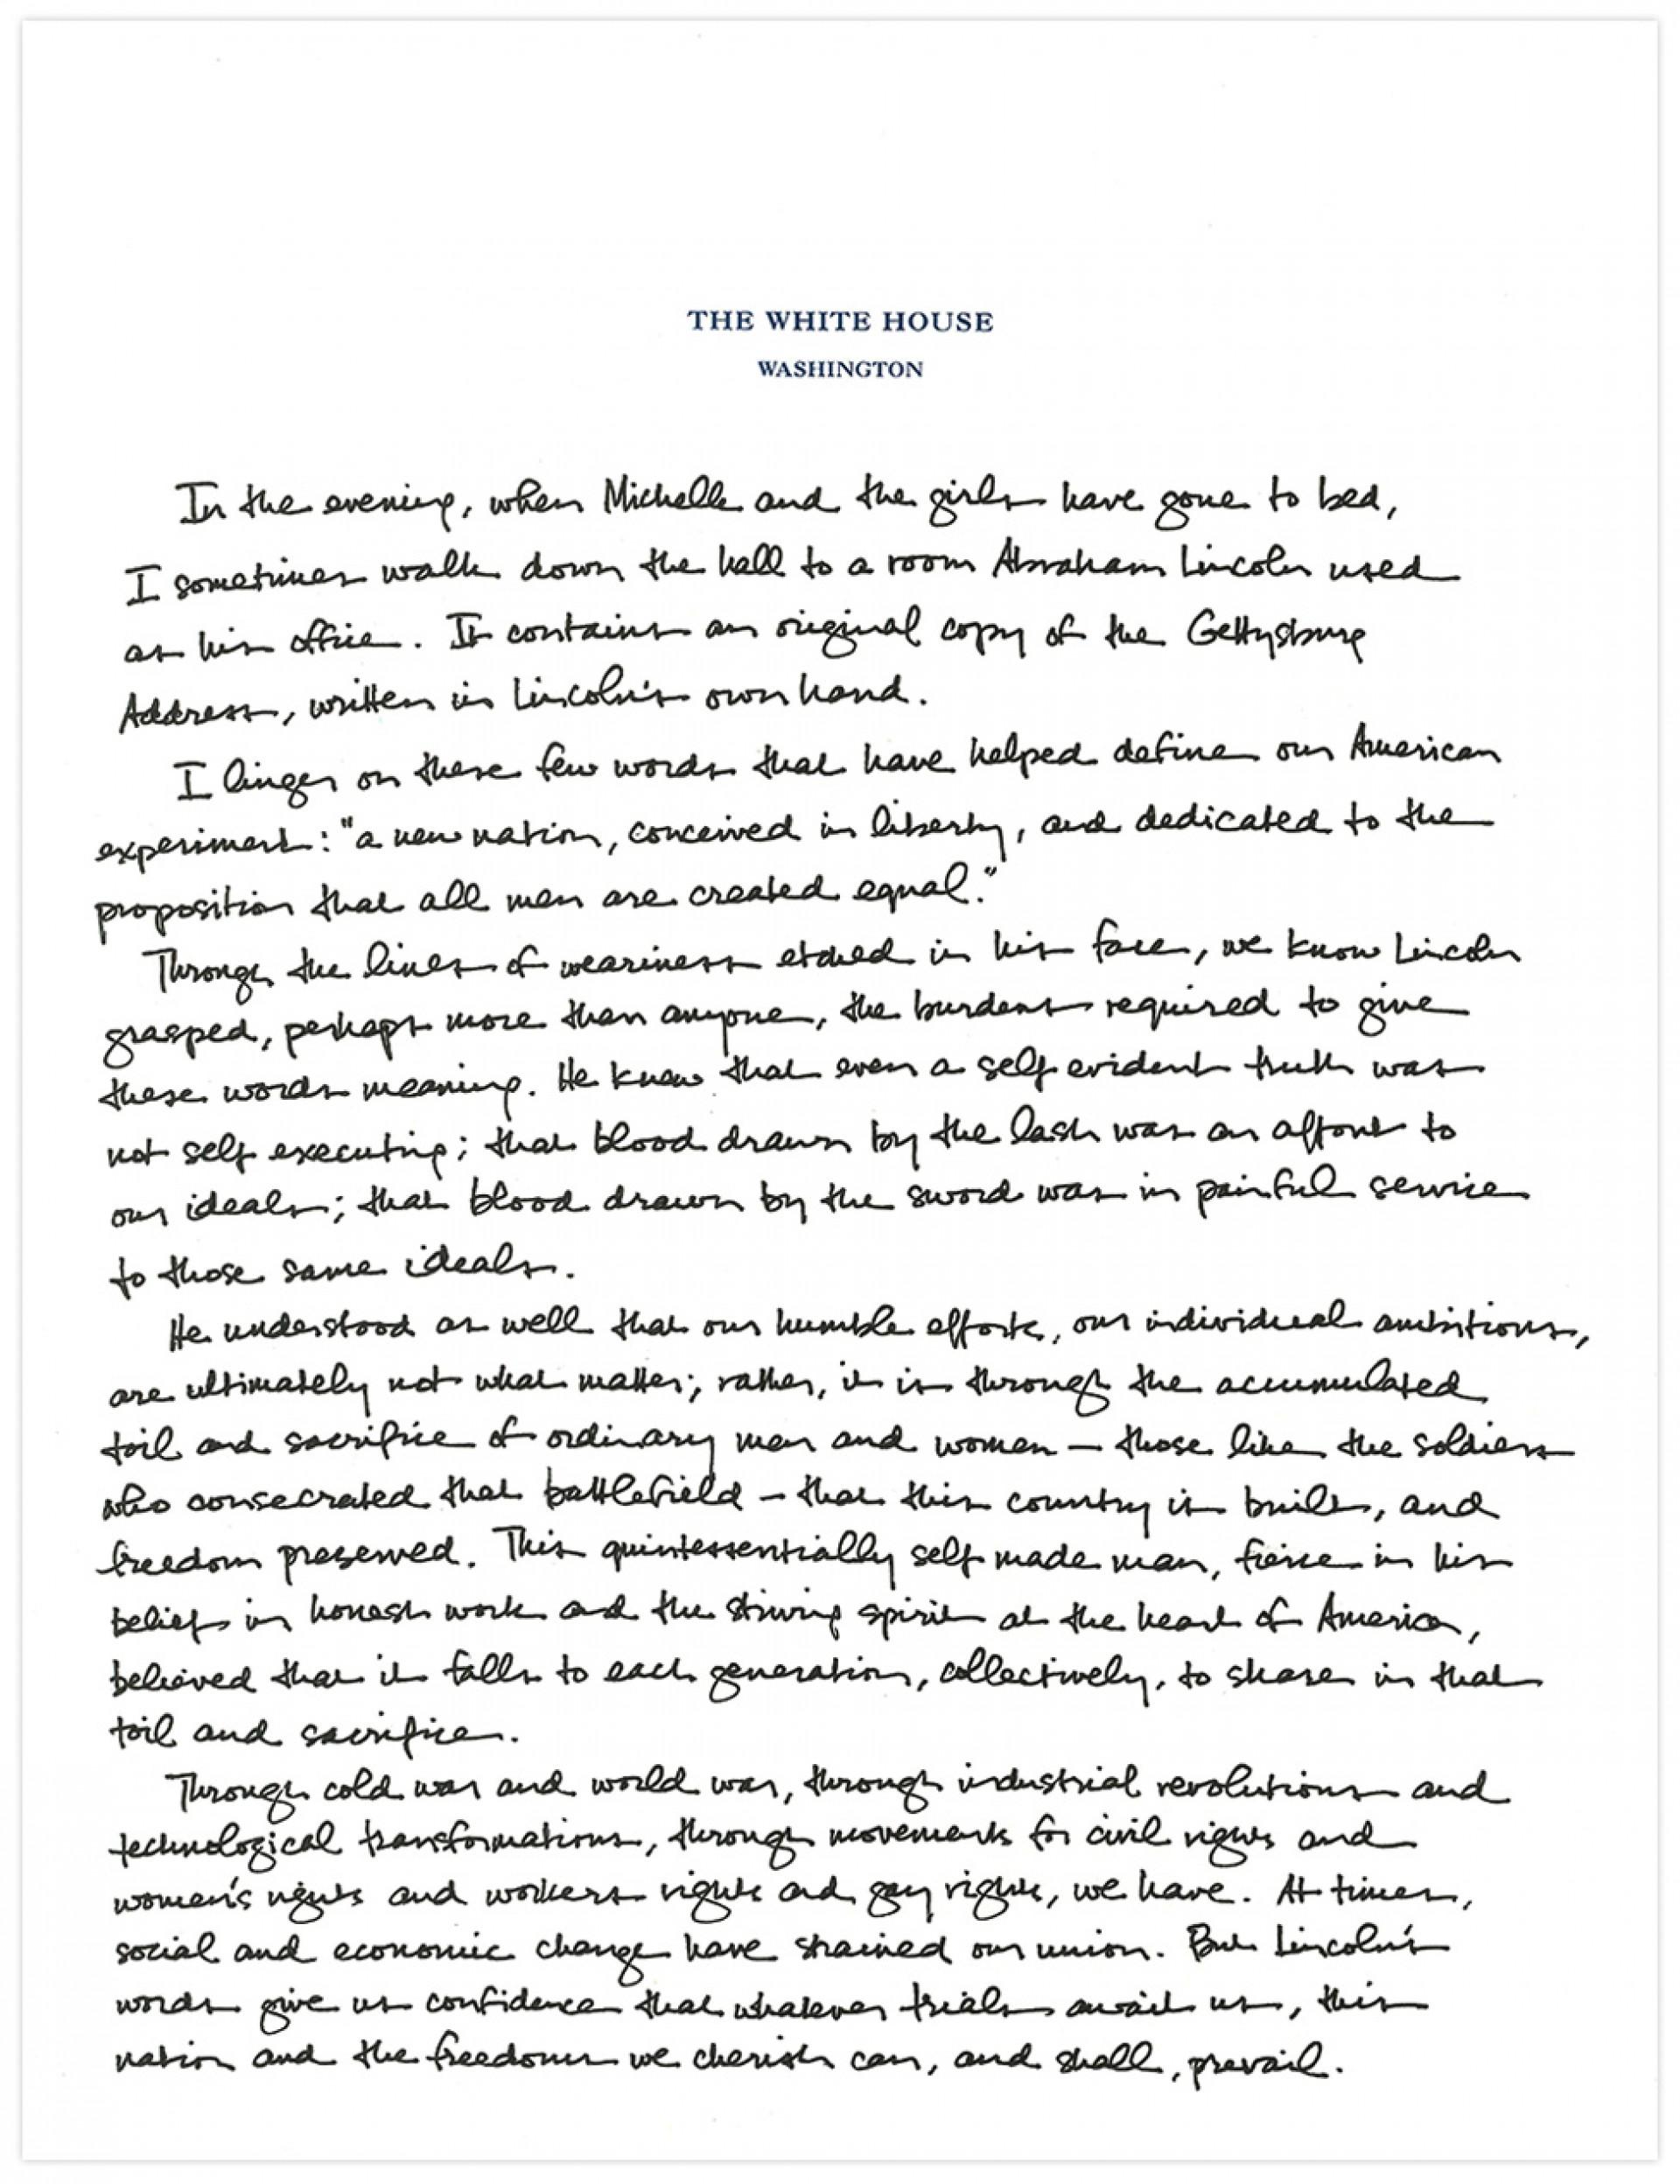 009 Potus Gettysburg Web 2013 Essay On Handwriting Fearsome Short Importance Of Good In Hindi Gujarati 1920